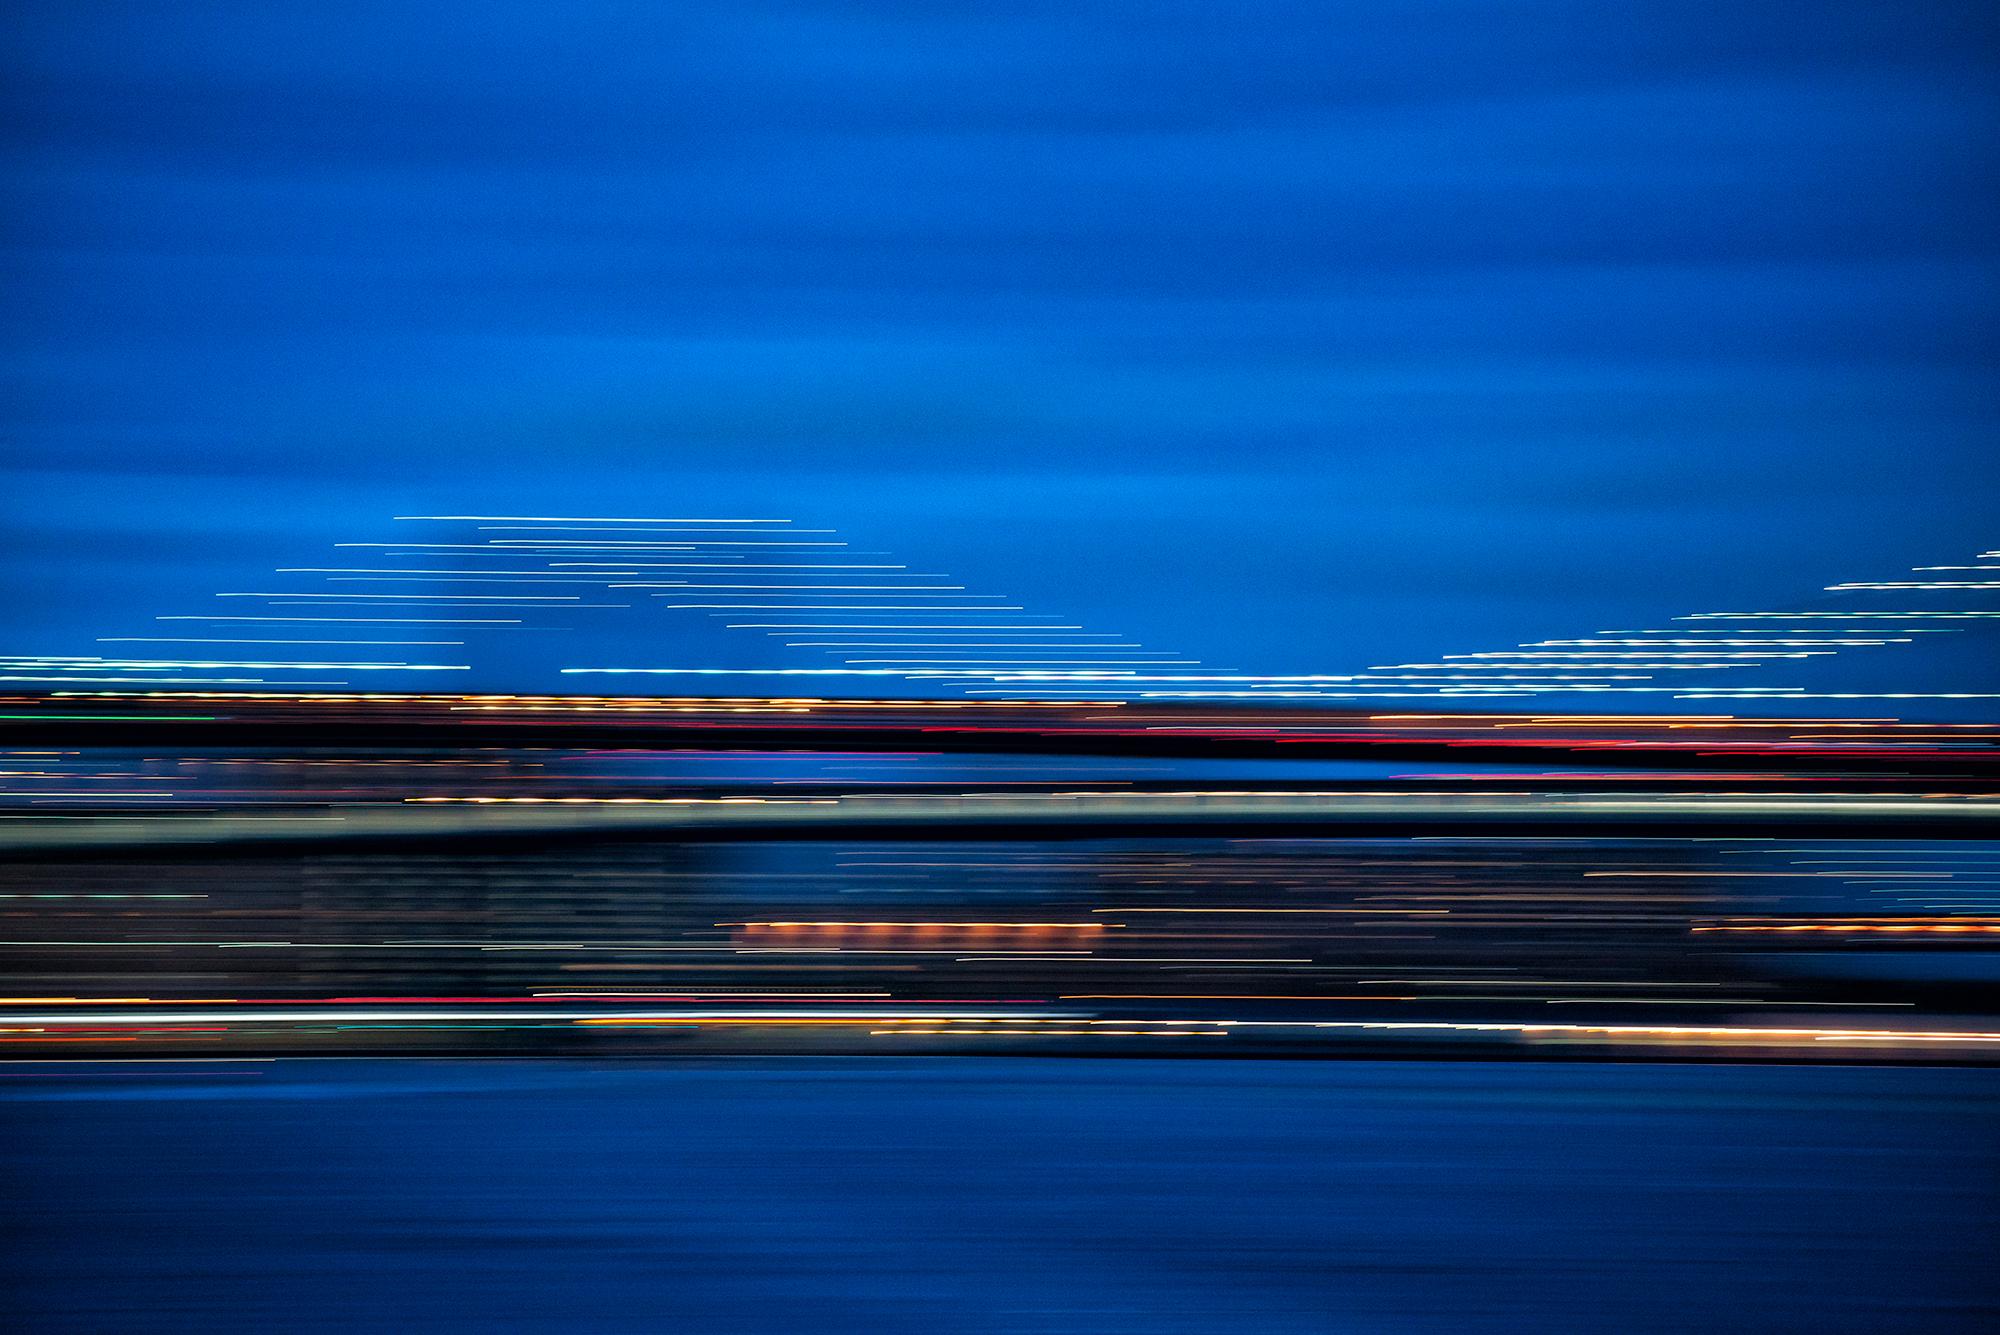 Brooklyn Bridge, Nightscape #1. NYC, 2015